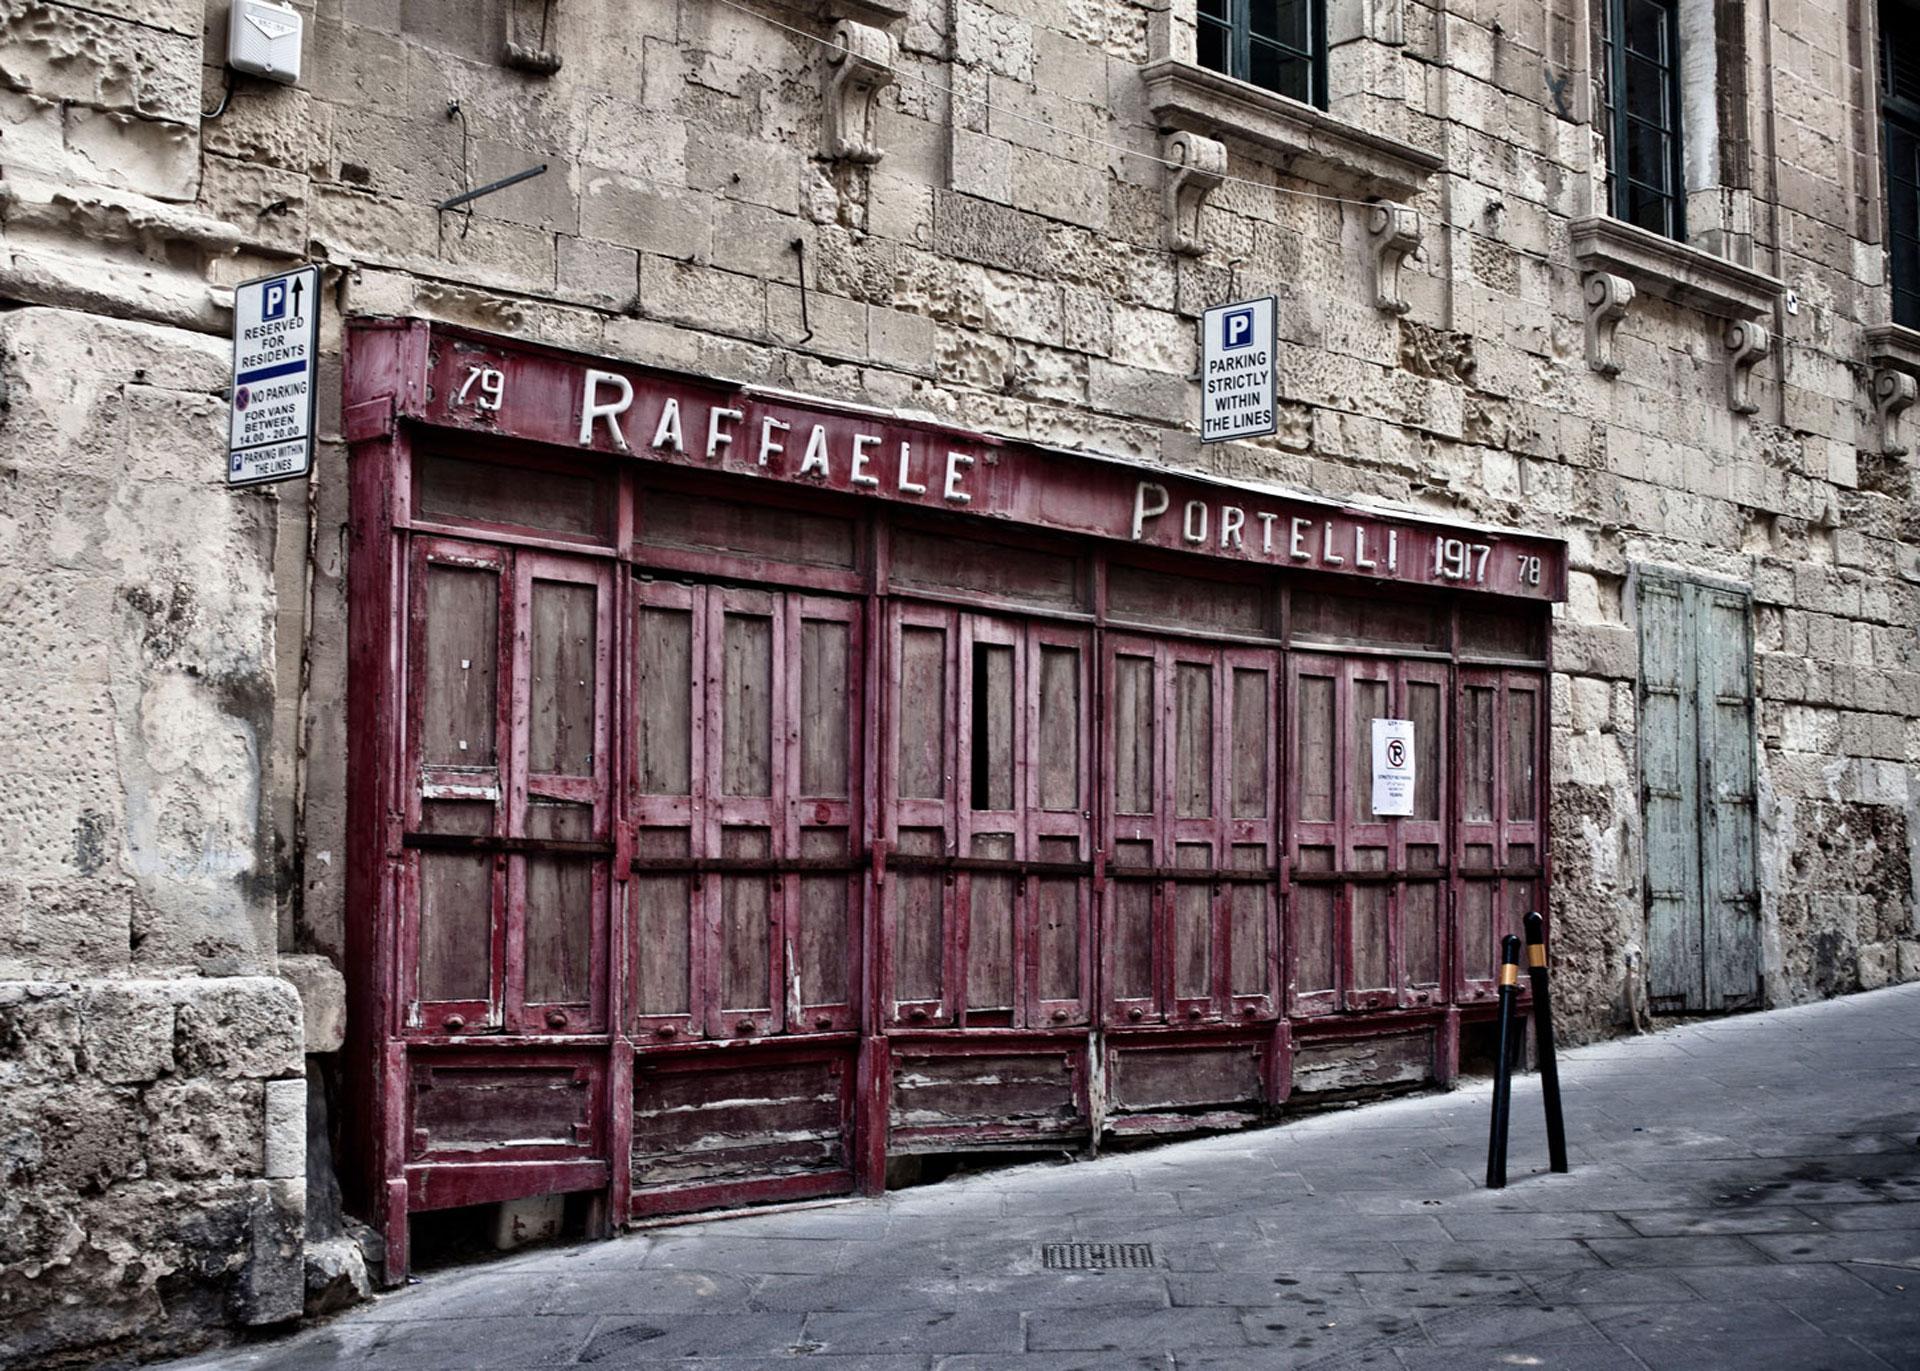 disappearingMalta - Raffaele Portelli vintage storefront (1917), Valletta, Malta ©Helen Jones-Florio photography prints